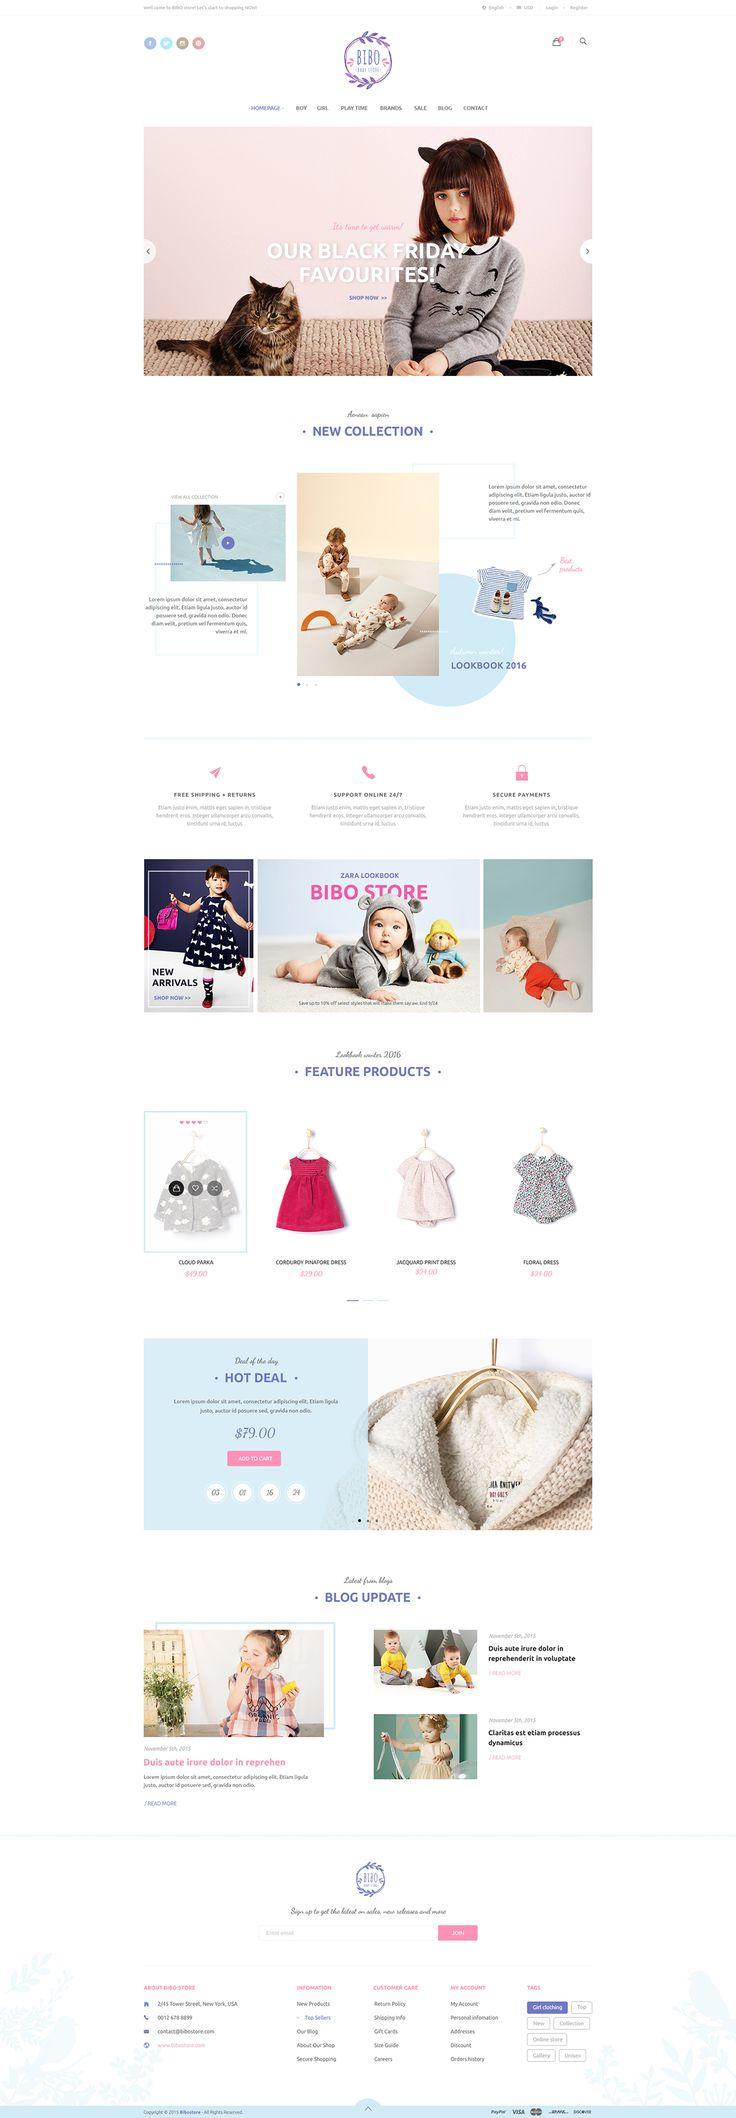 Bibo - Baby Store PSD Template on Behance